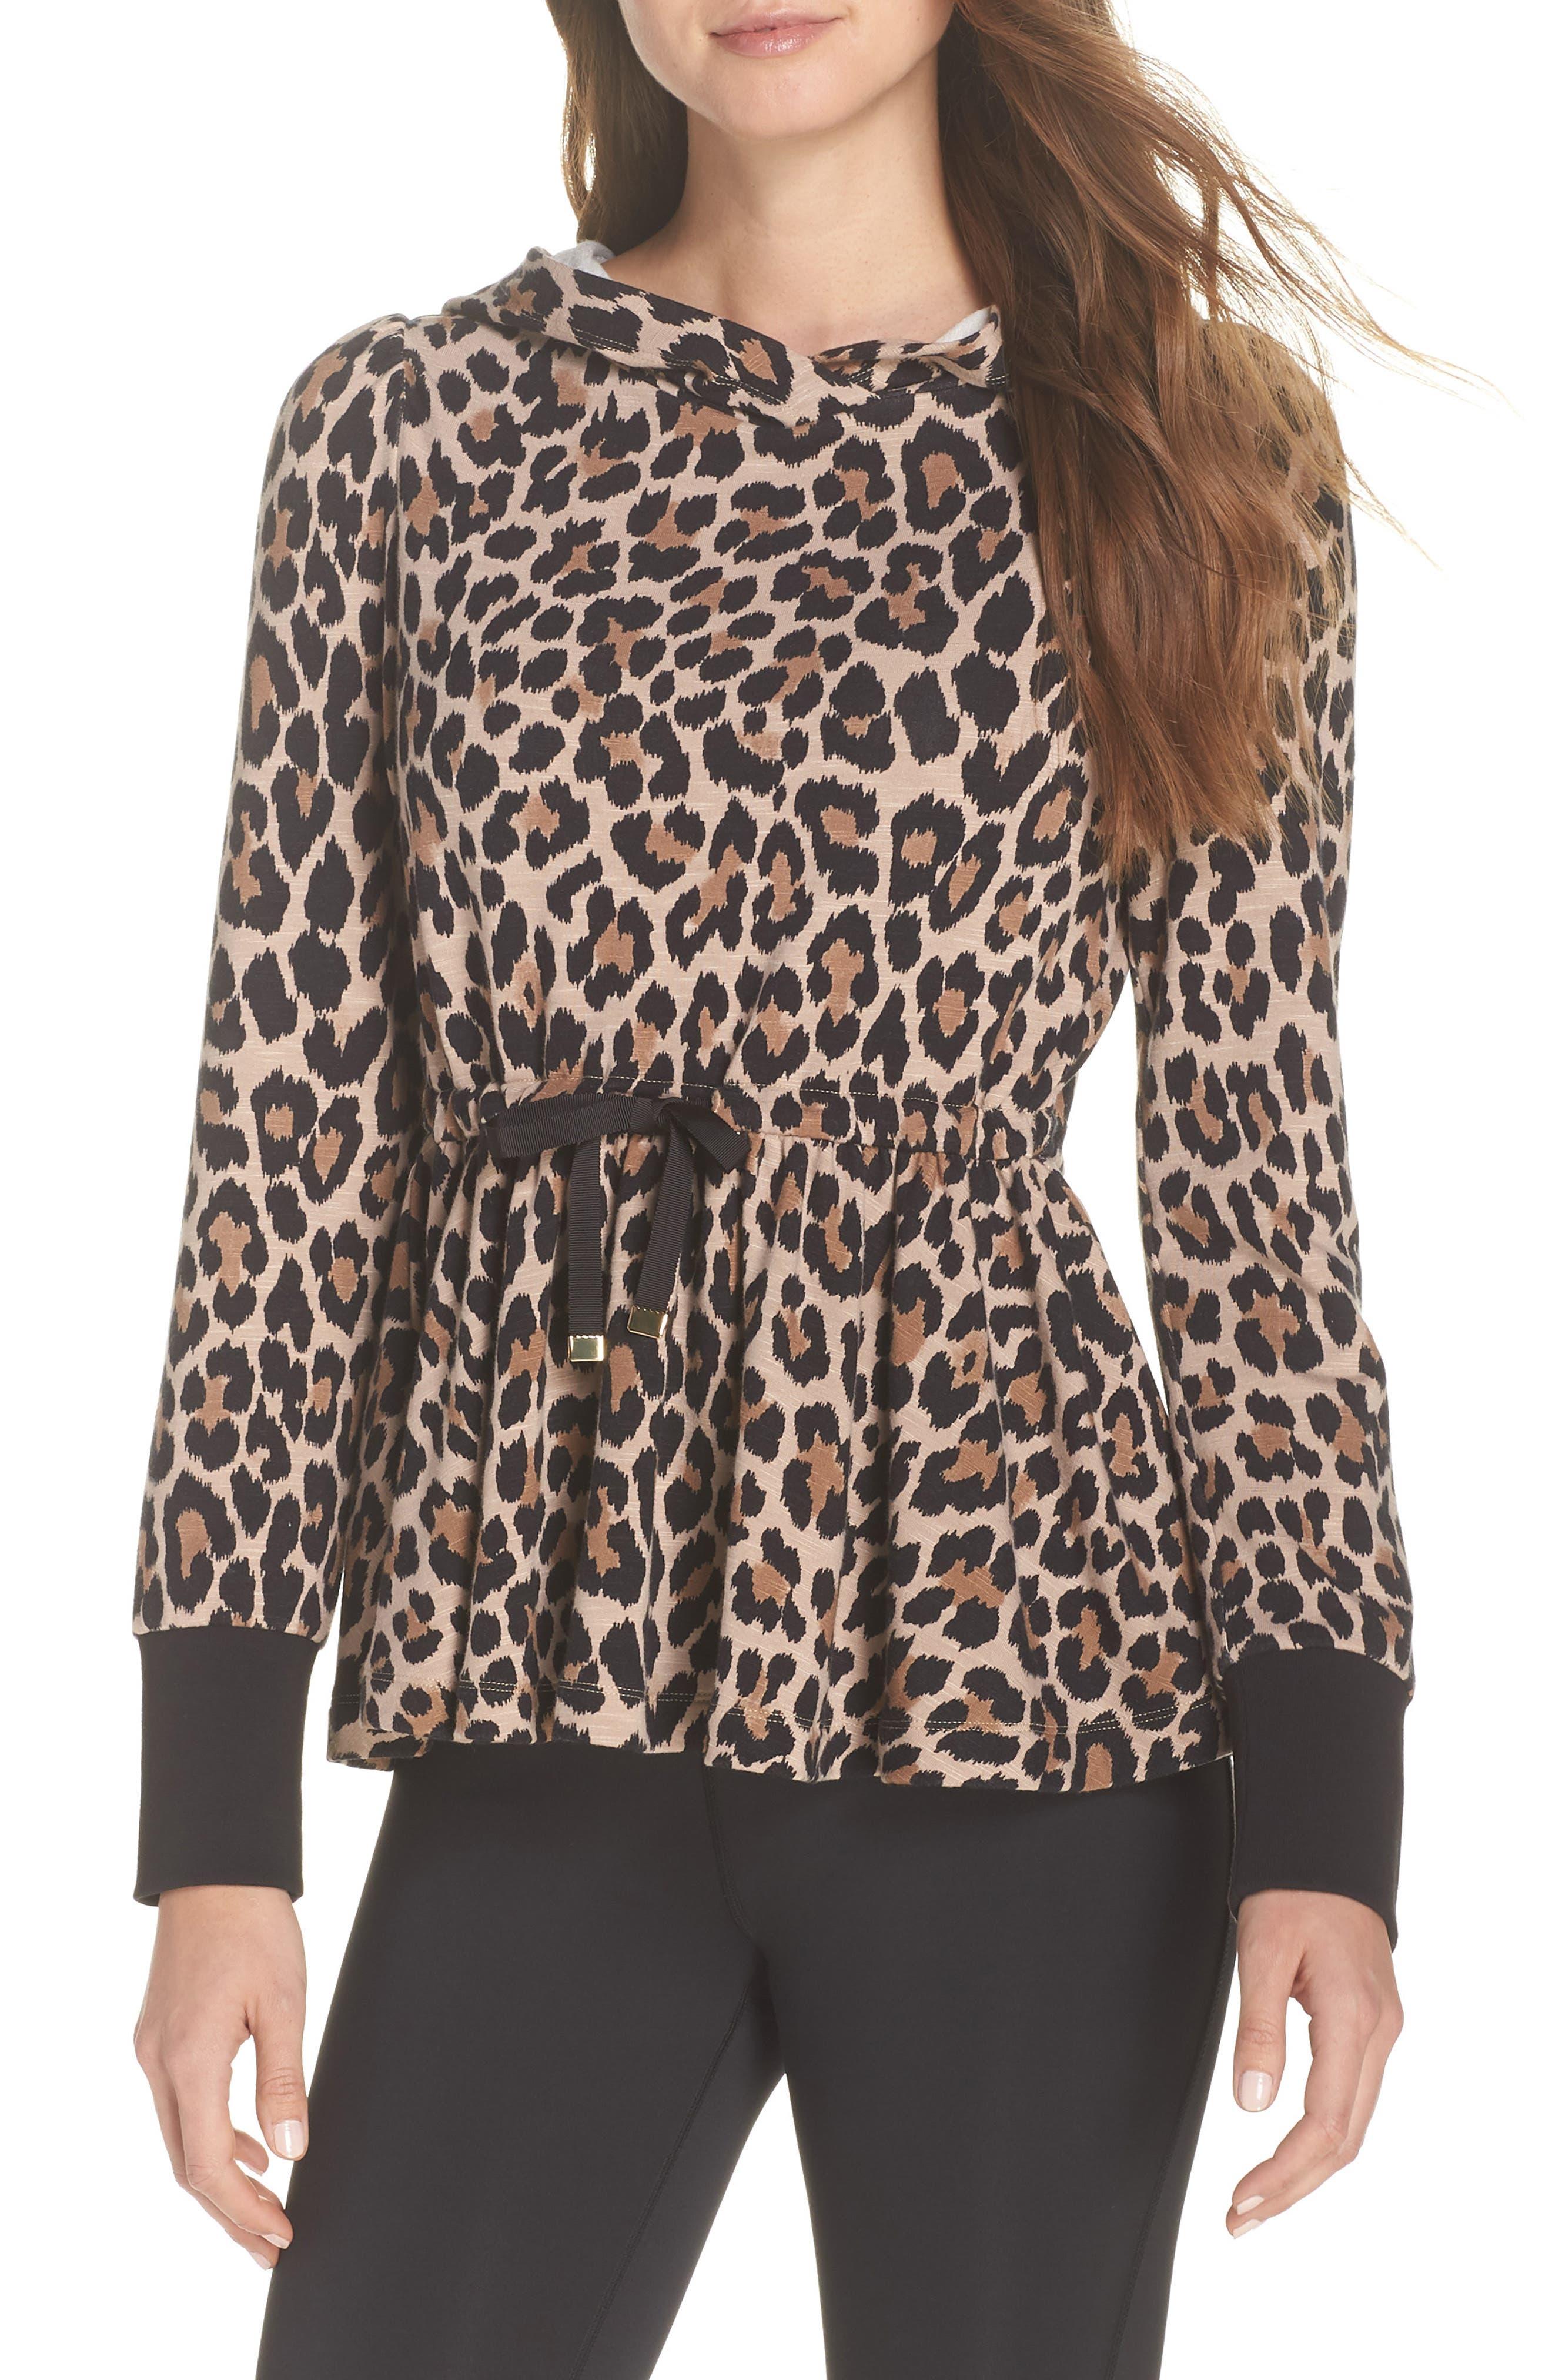 Kate Spade New York Leopard Ruffle Hoodie, Beige